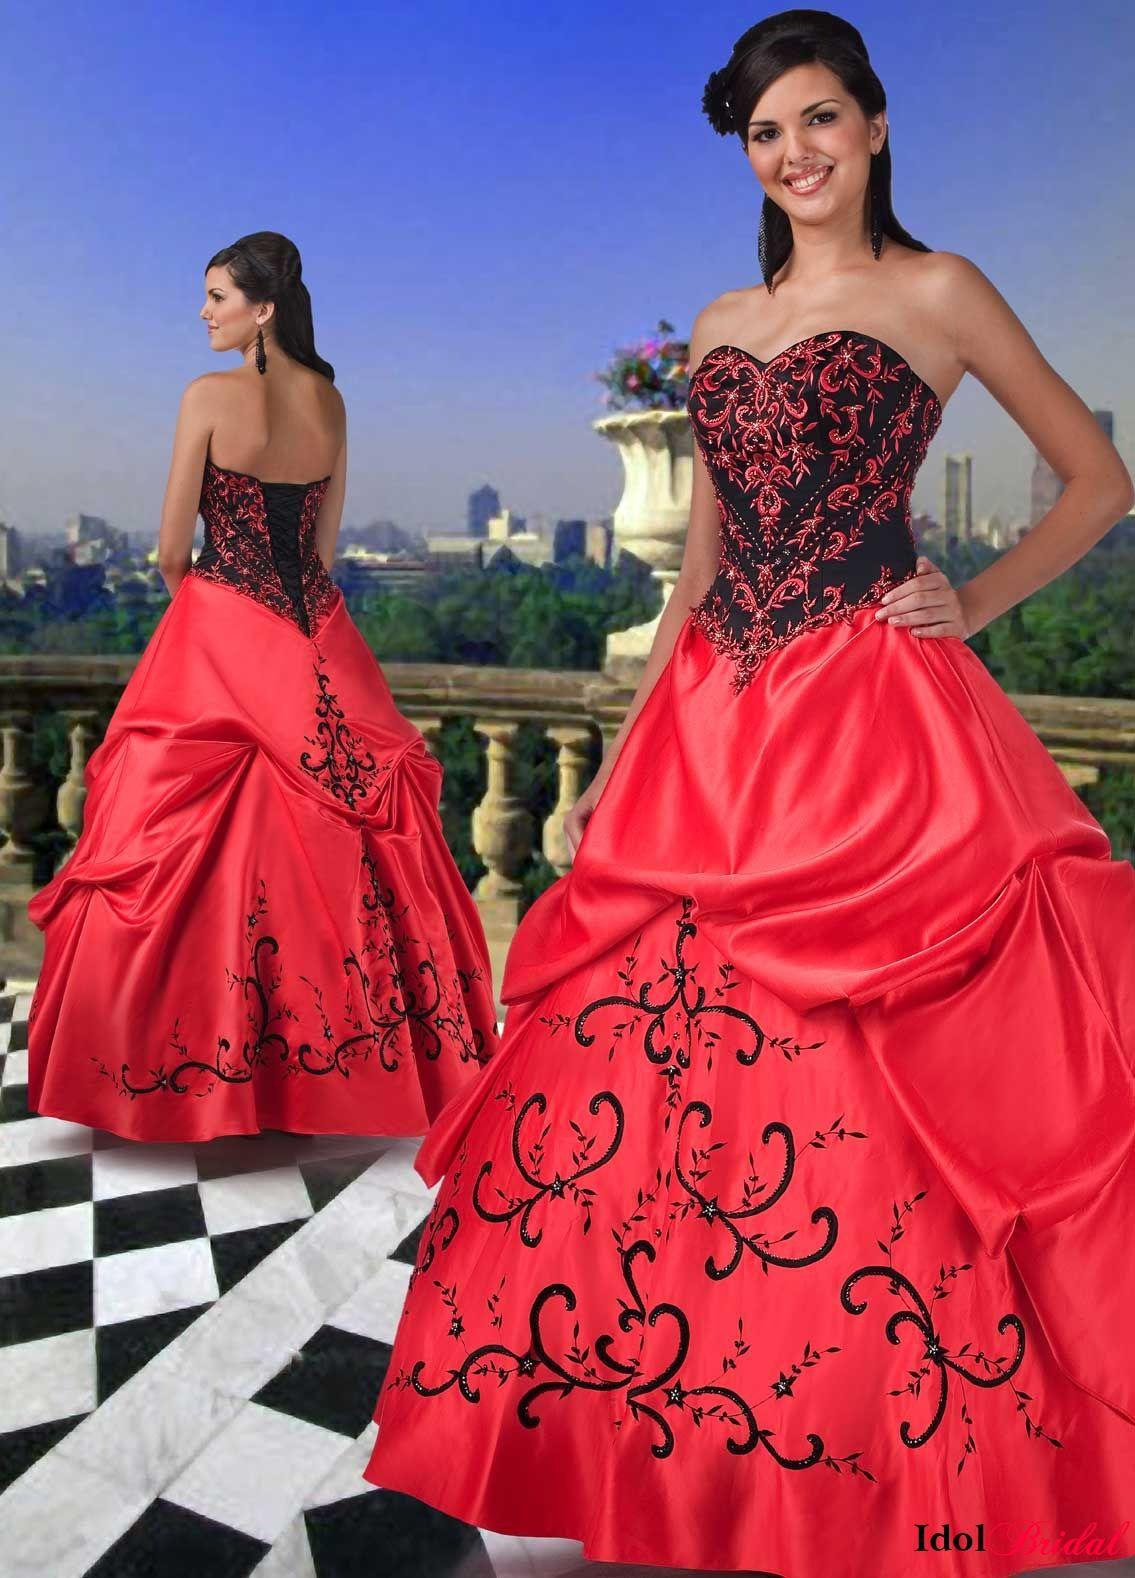 Quinceanera dresses idp usdolbridal offer